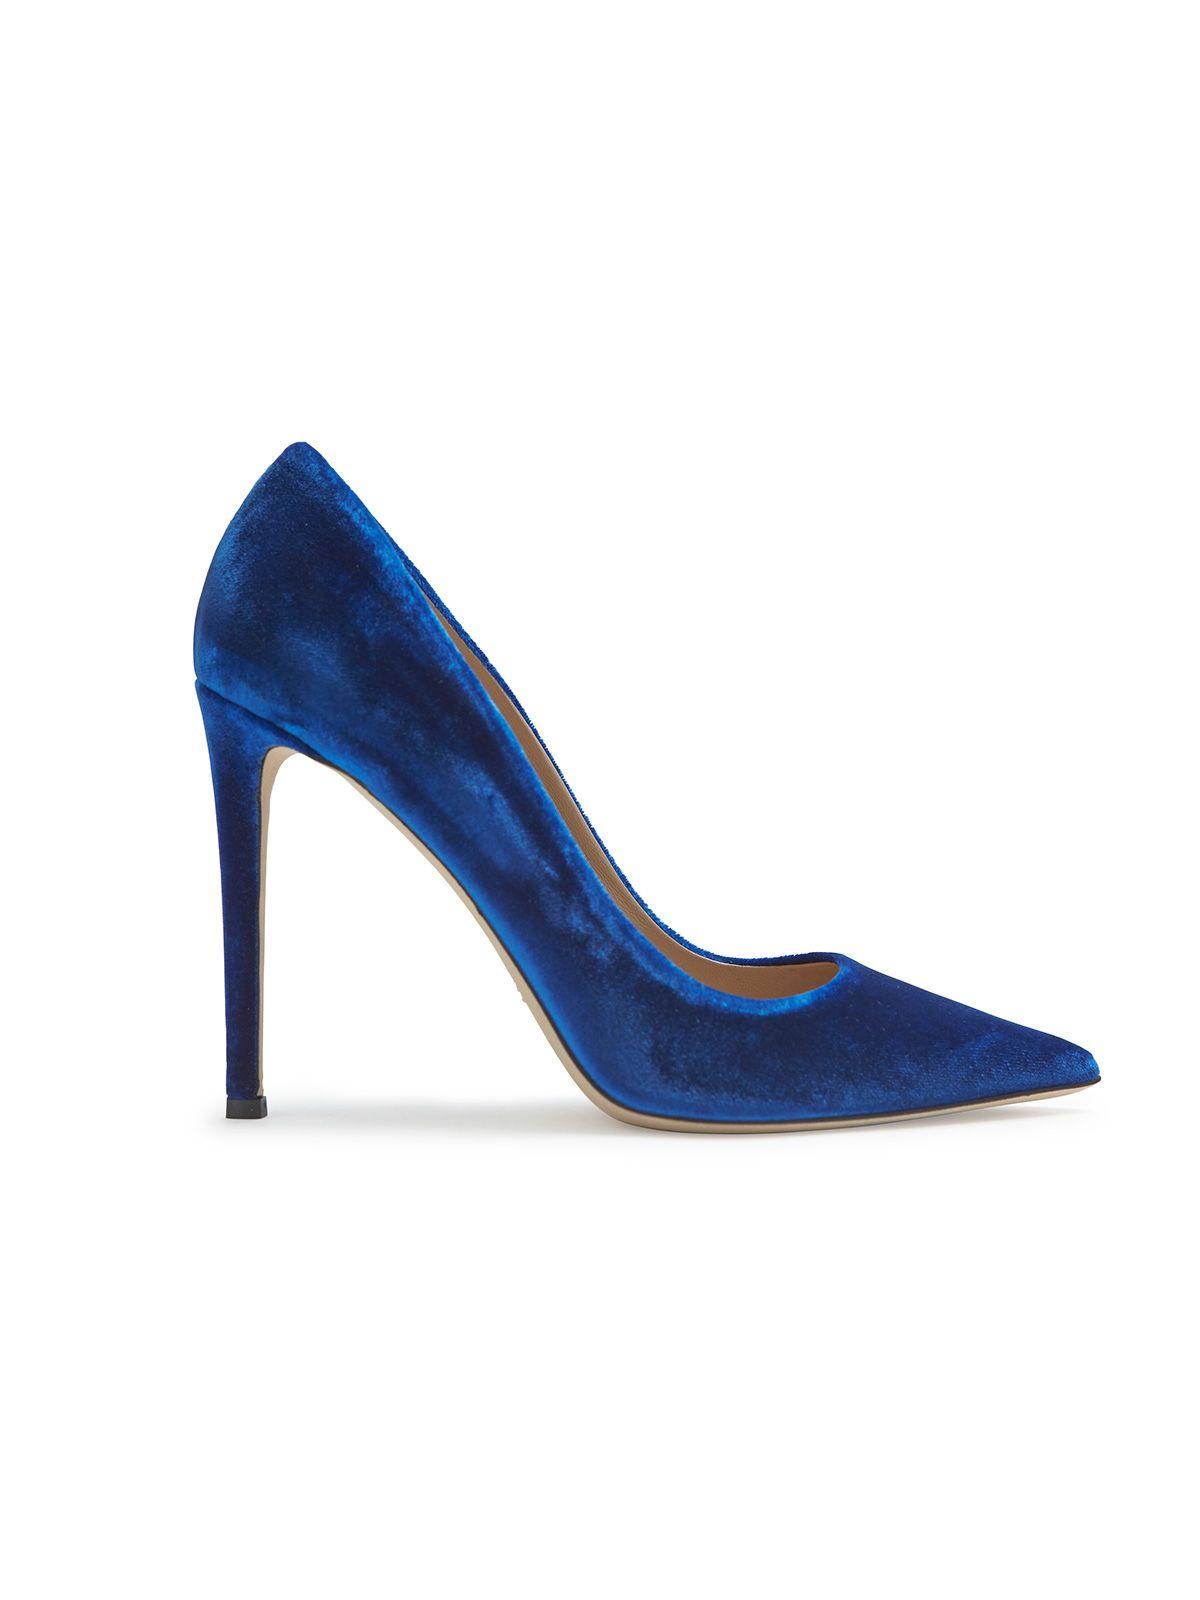 bd4ad16512d7e2 Tamara Mellon velvet pumps in blue Designer Pumps